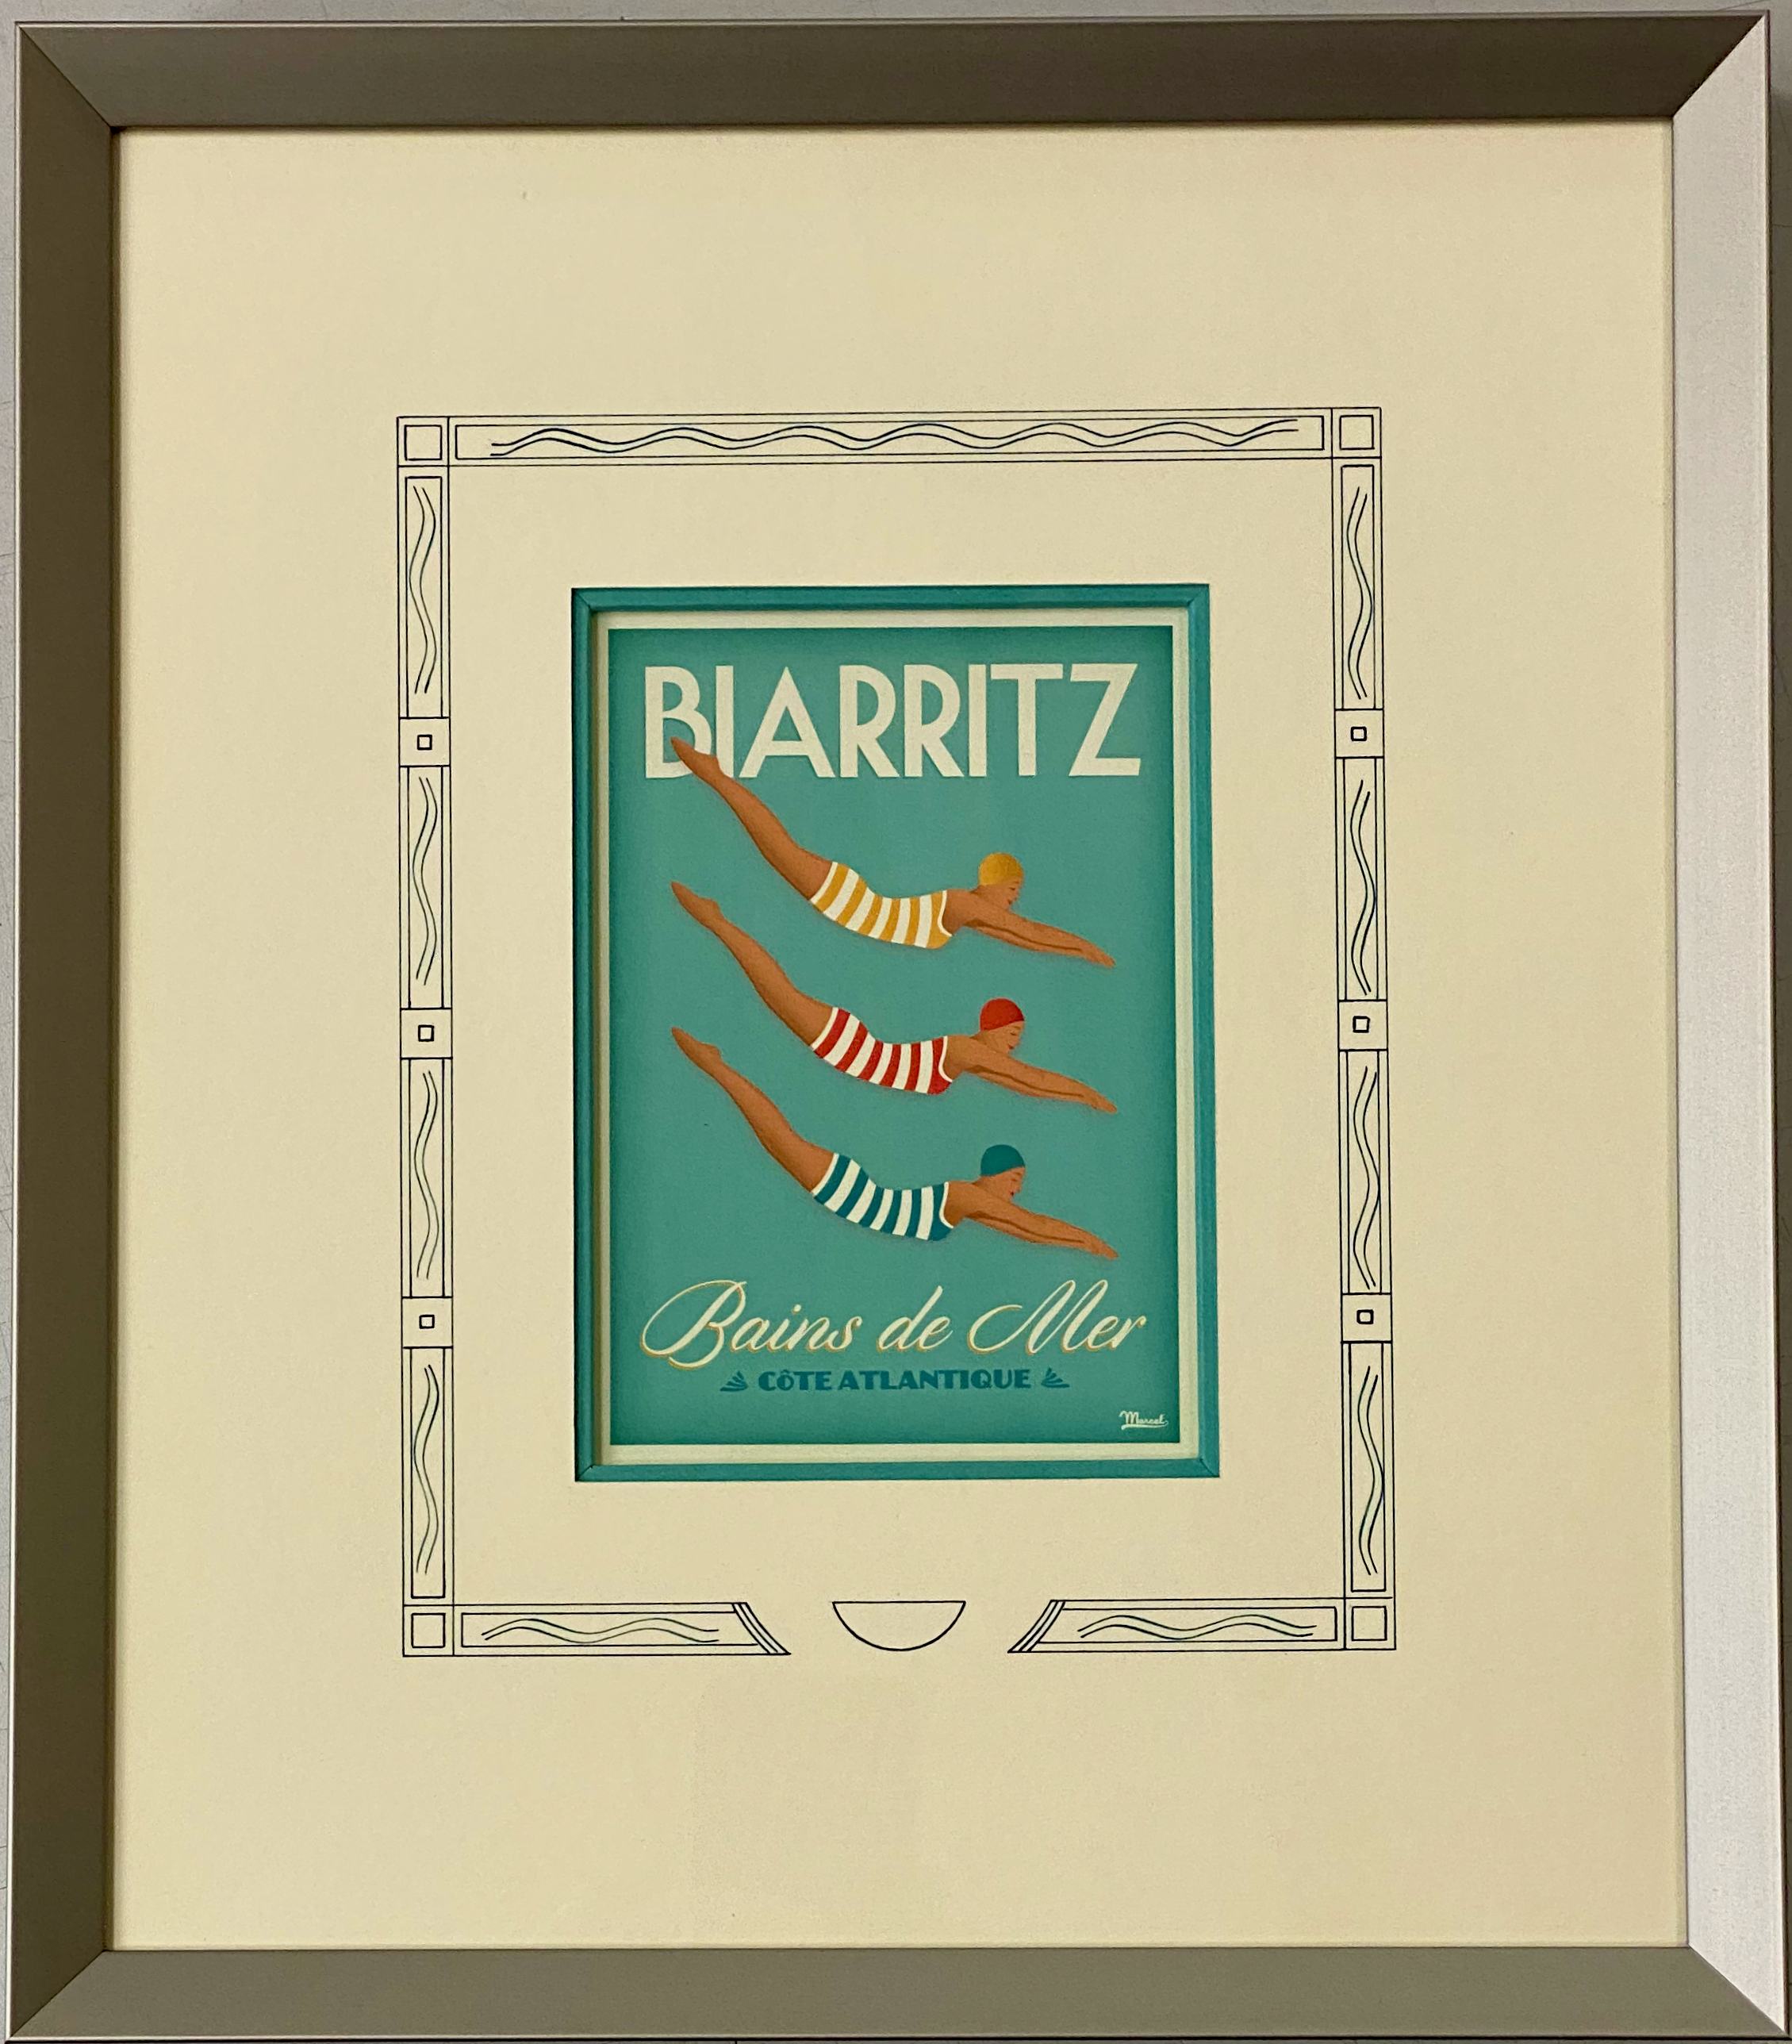 Biarritz, Bains de mer.